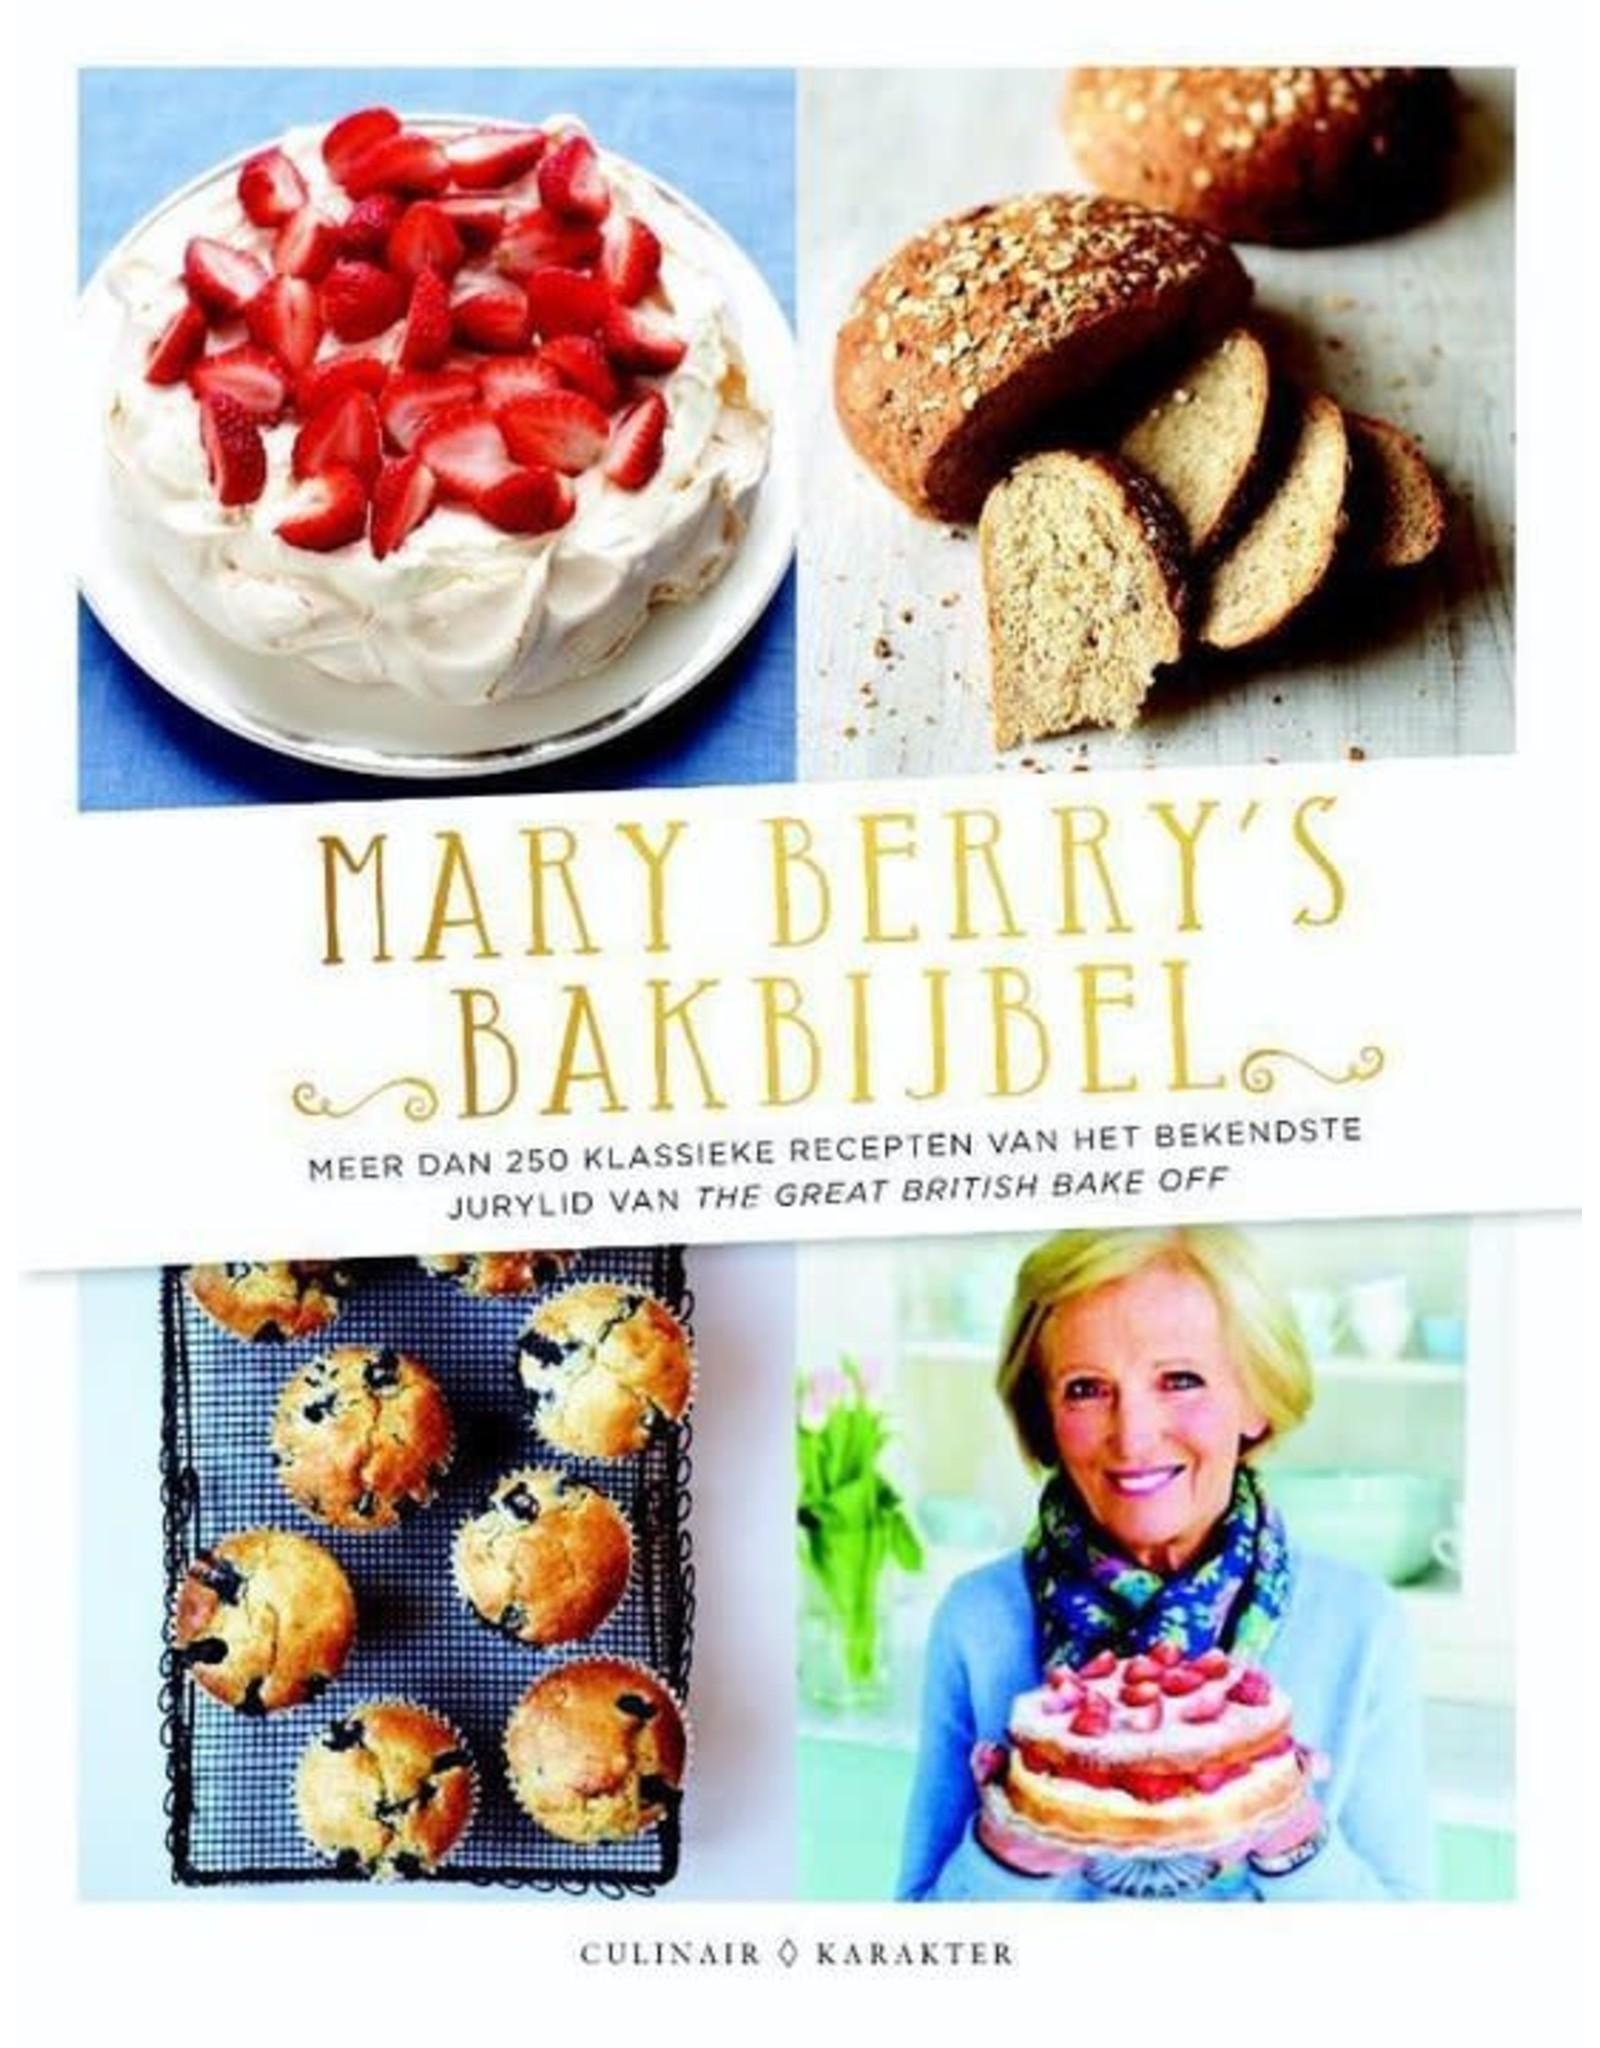 Mary Berry's bakbijbel [PB]